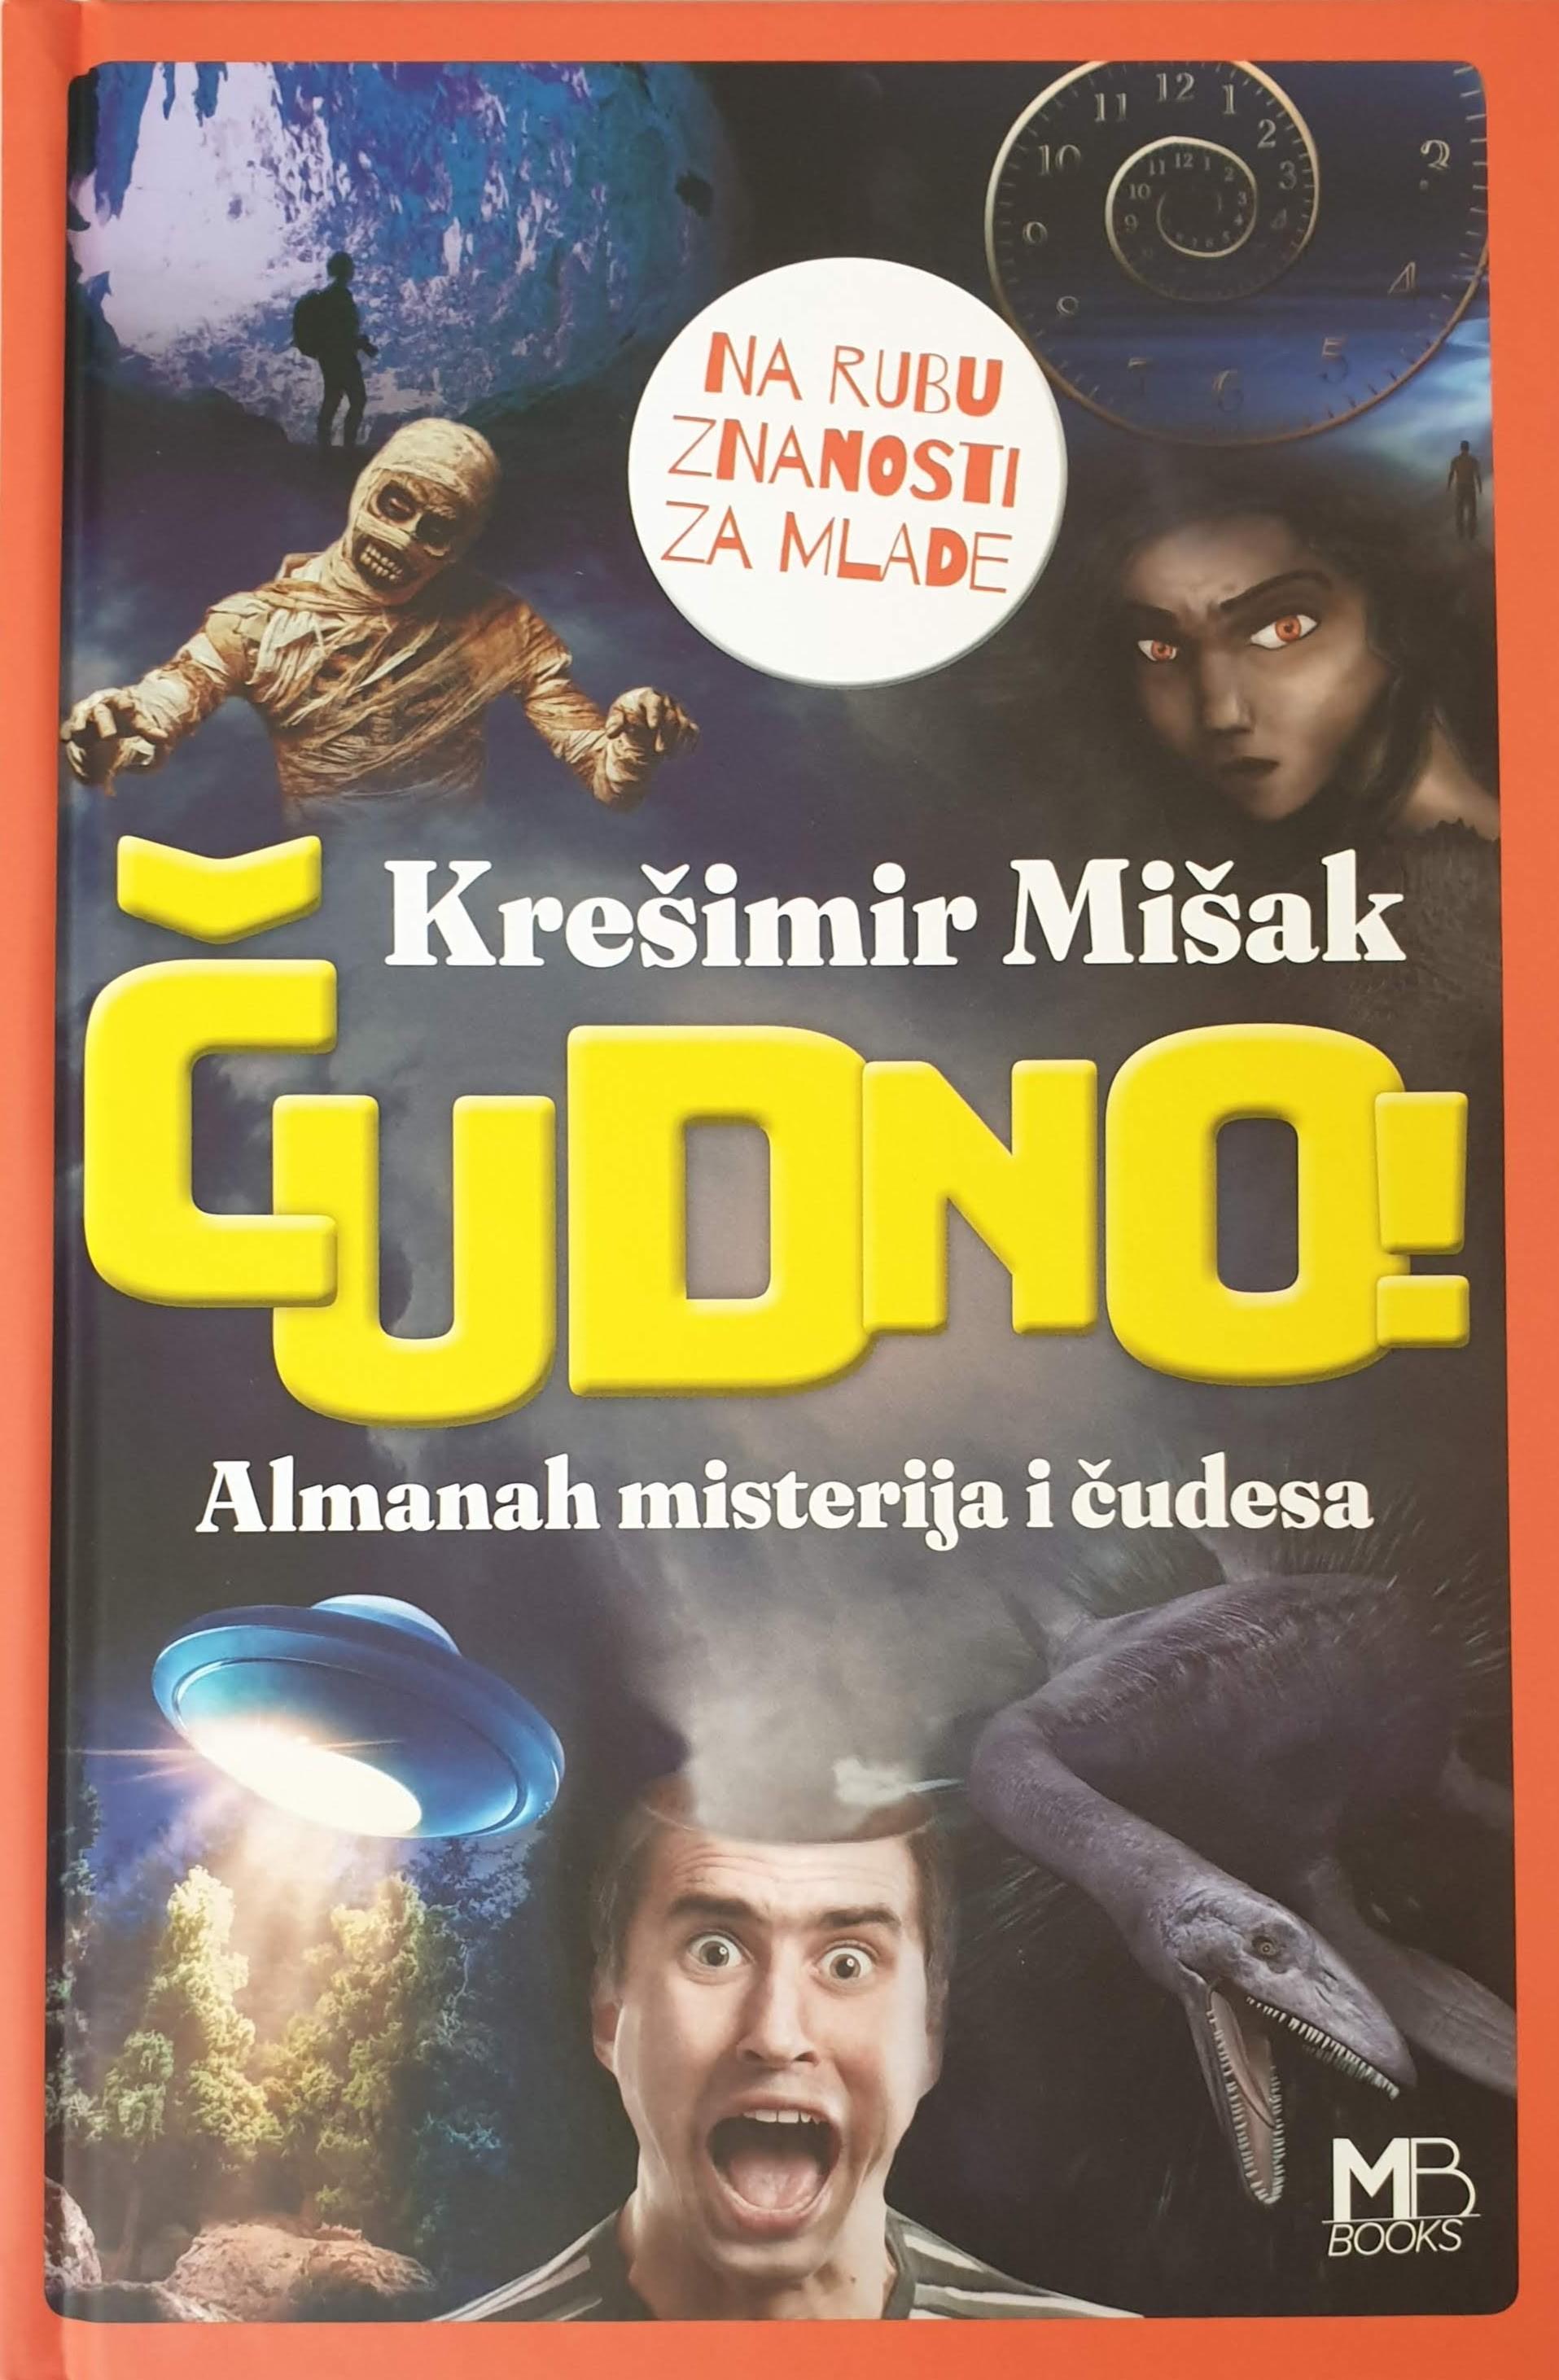 Krešimir Mišak: Čudno! Almanah misterija i čudesa